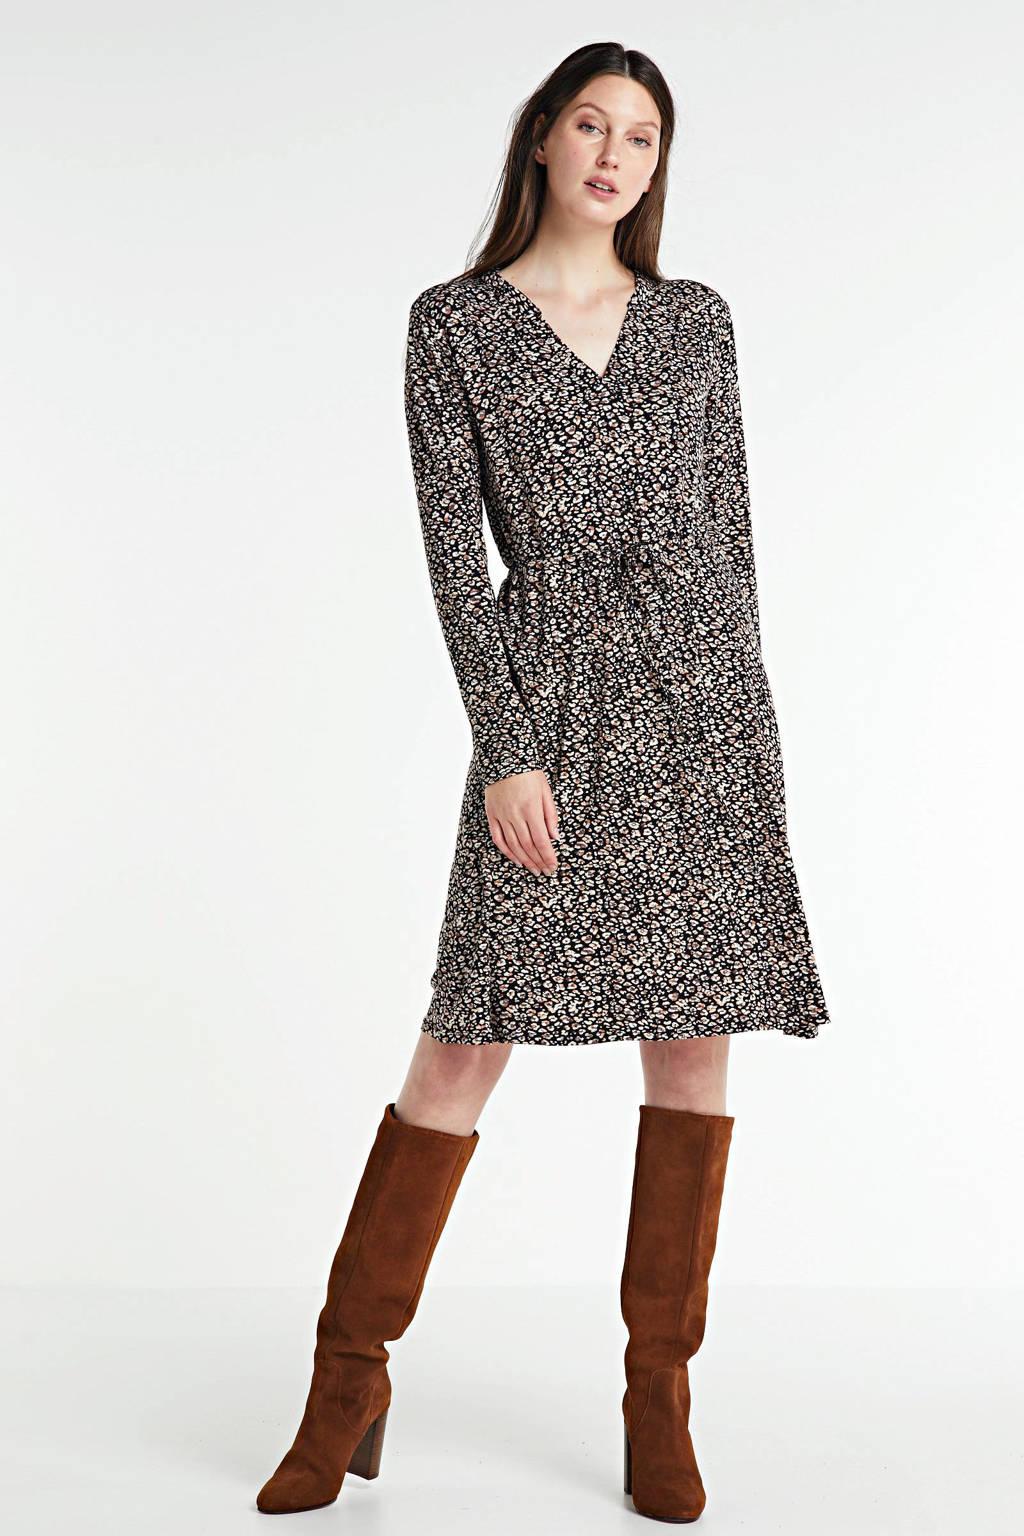 anytime jurk met panterprint zwart/multi, Zwart/multi